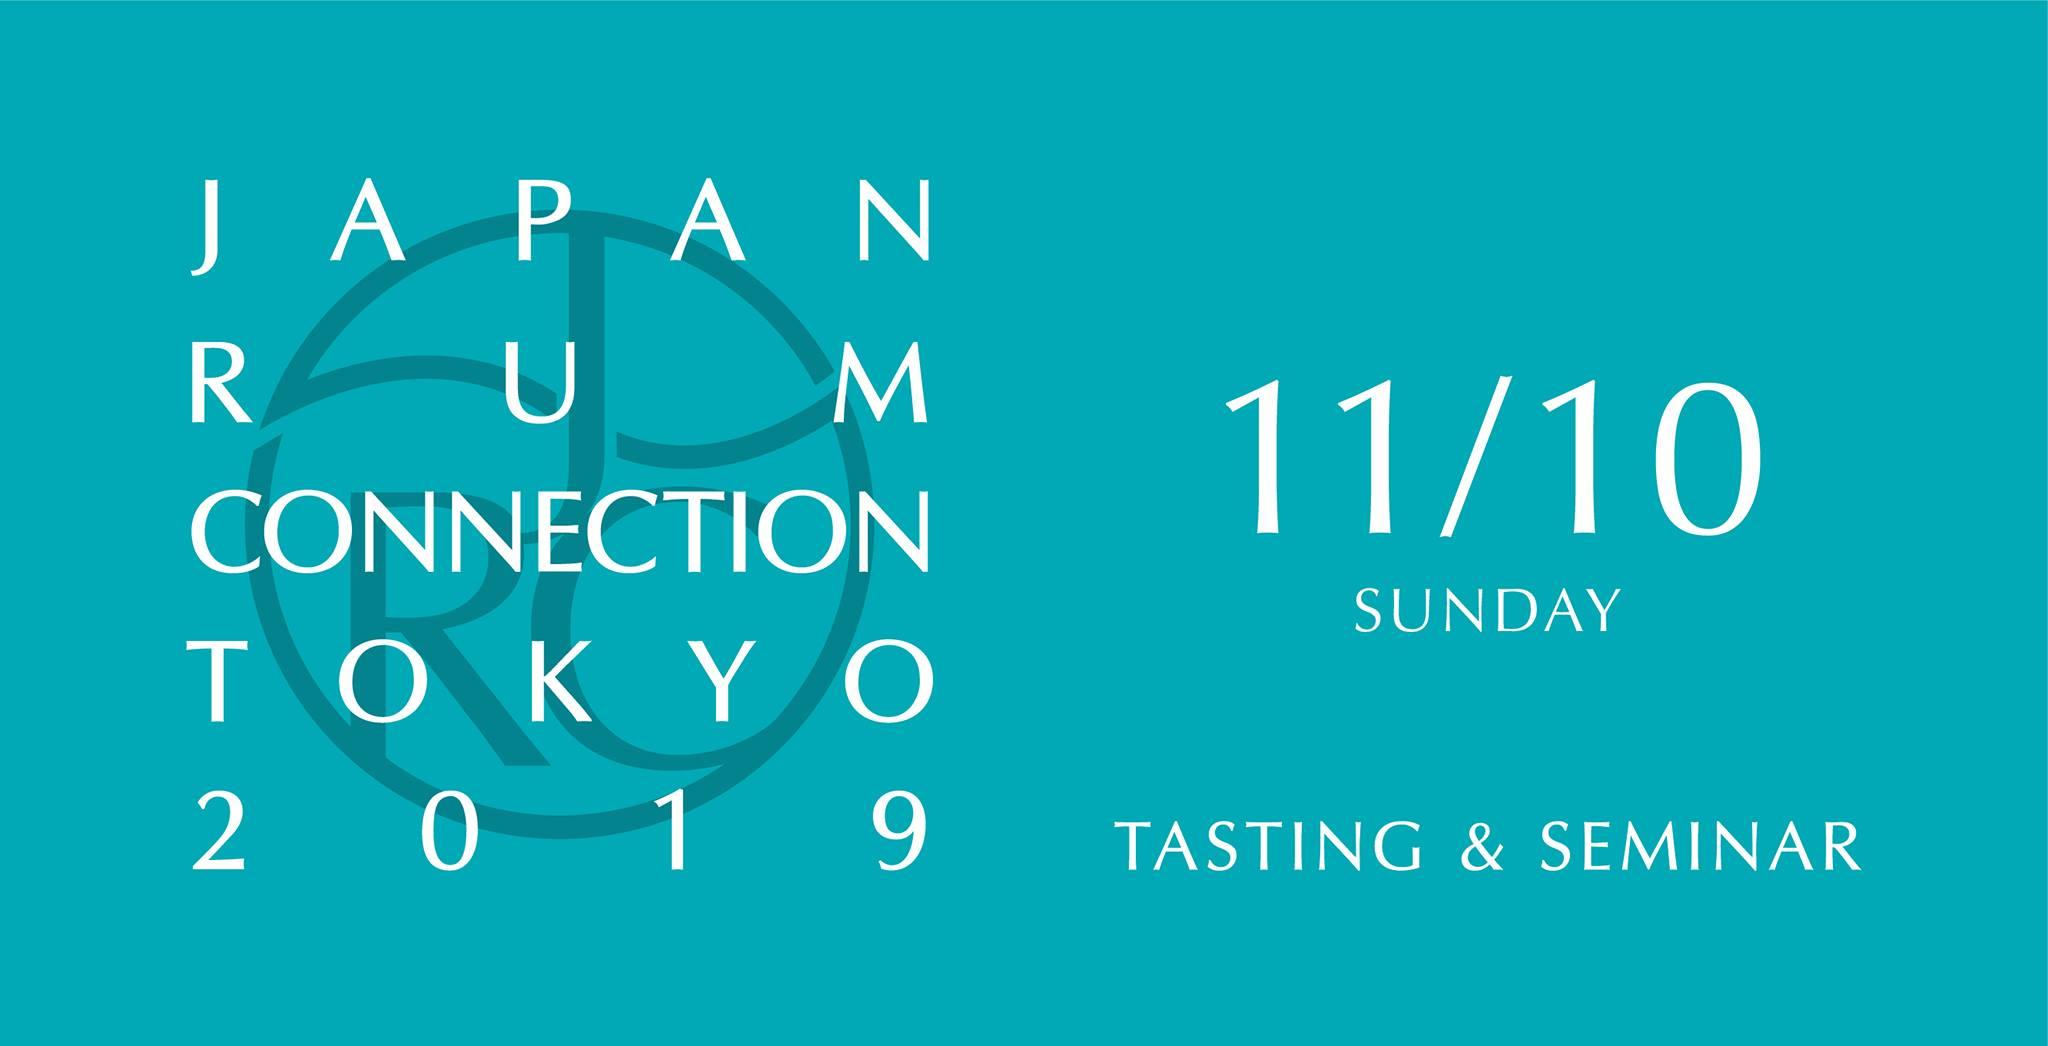 JAPAN RUM CONNECTION TOKYO 2019 TASTING & SEMINAR